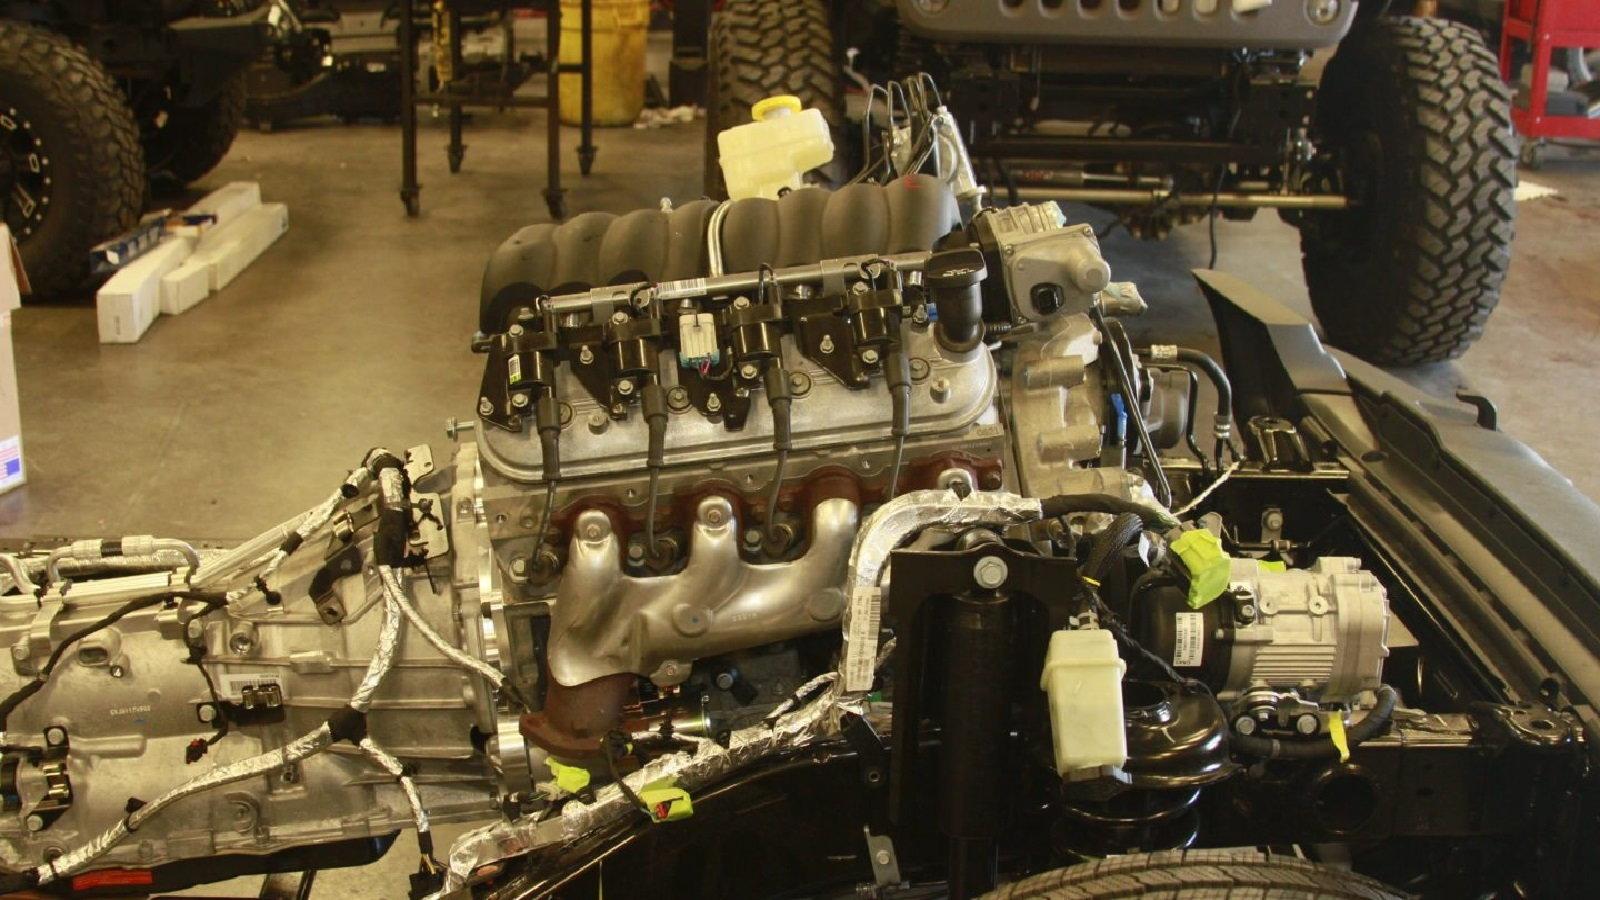 Get a 2018 Wrangler With a Chevy LS V8